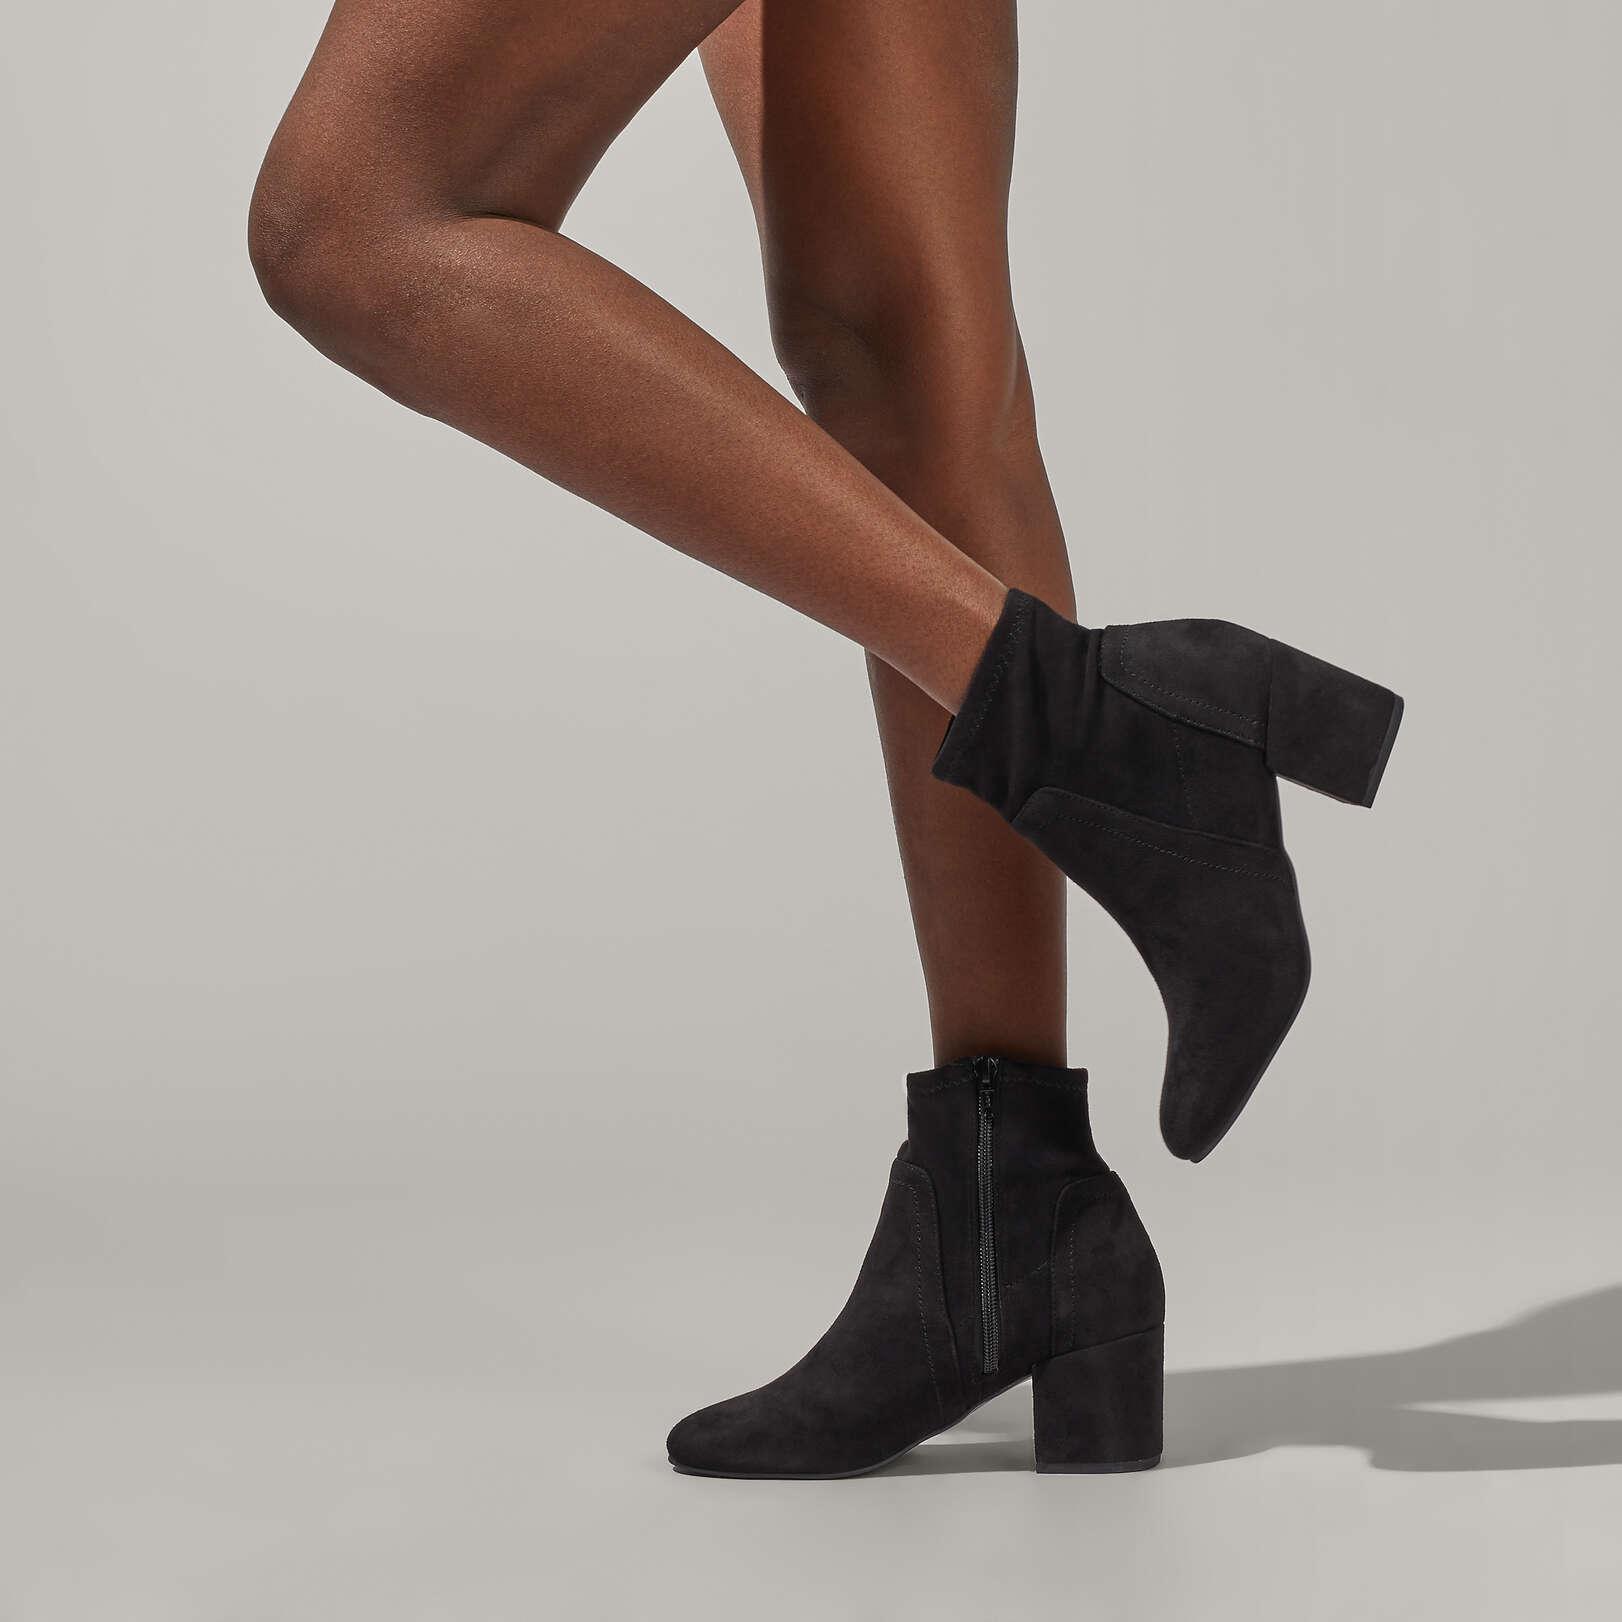 JEMIMA - MISS KG Ankle Boots